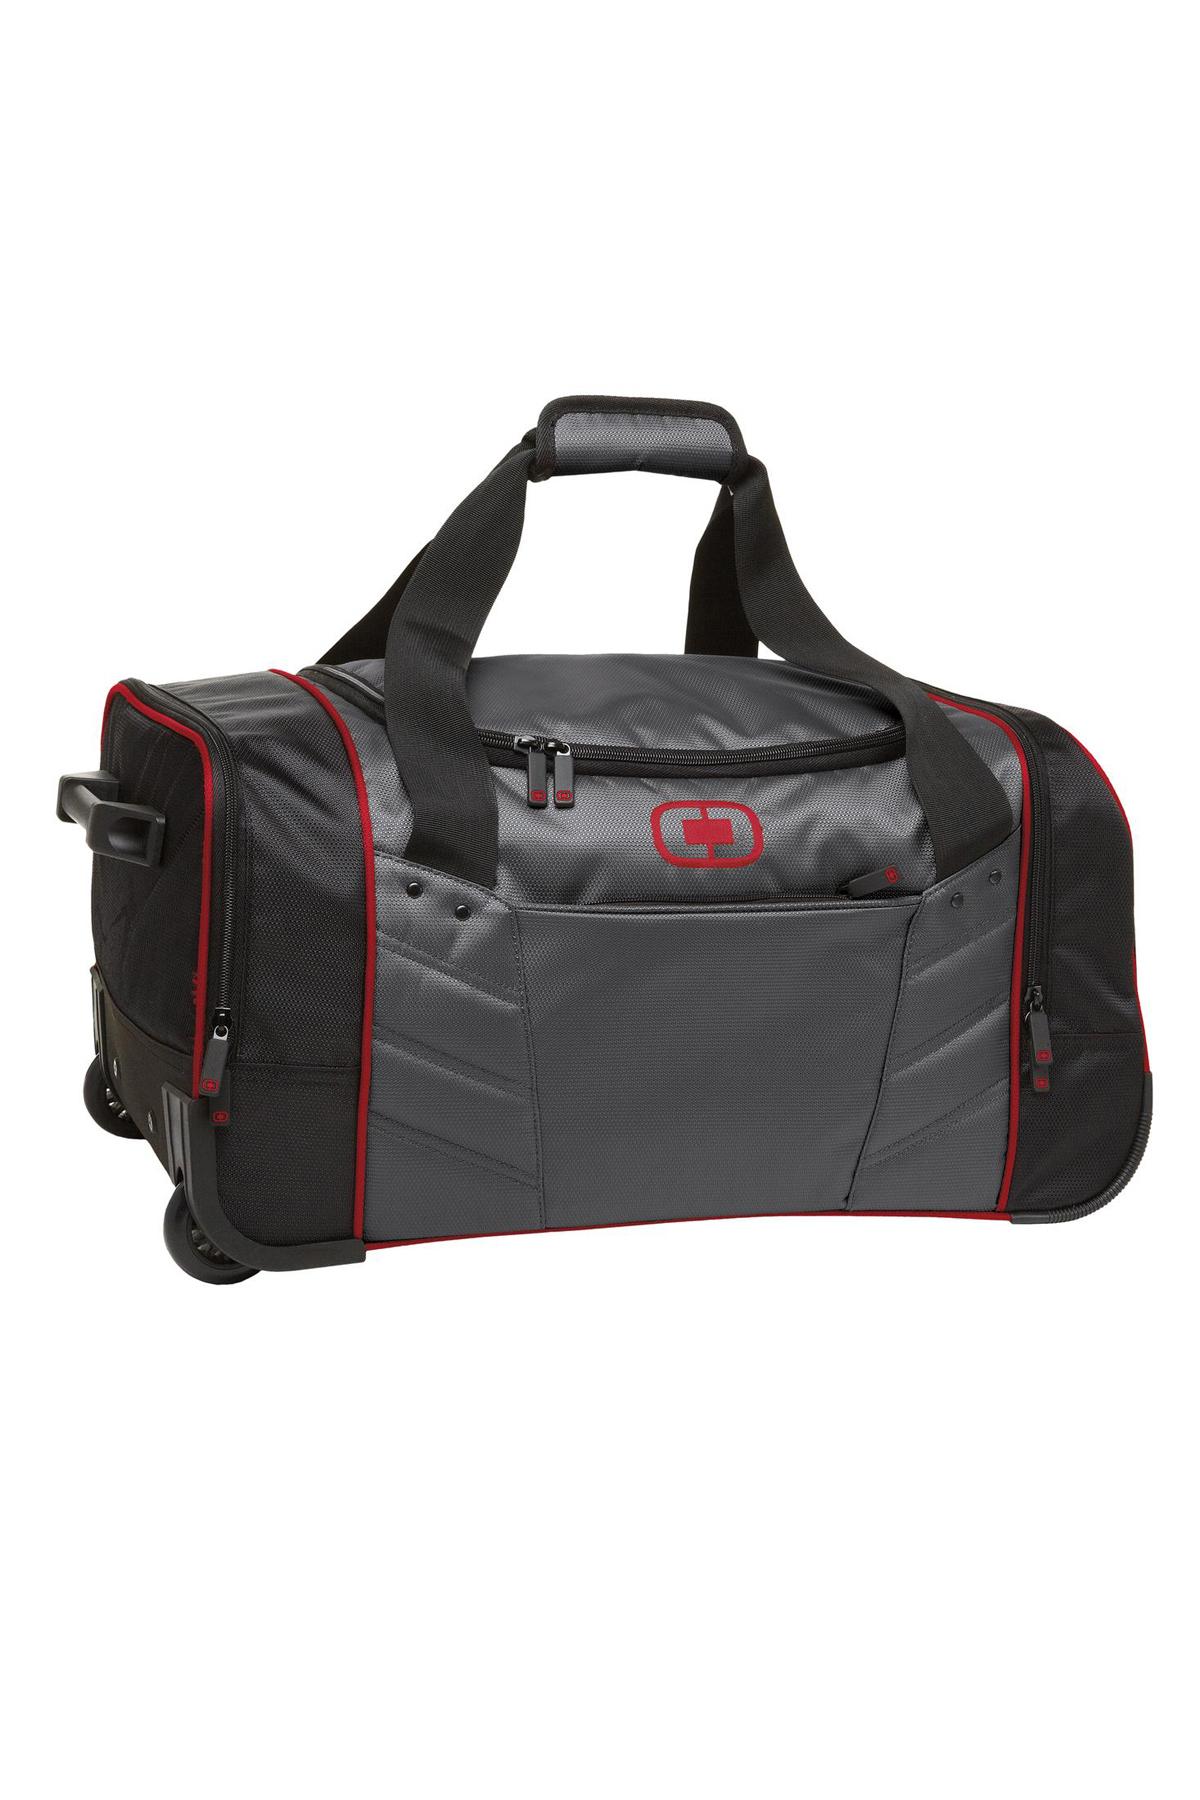 Bags-Duffels-4